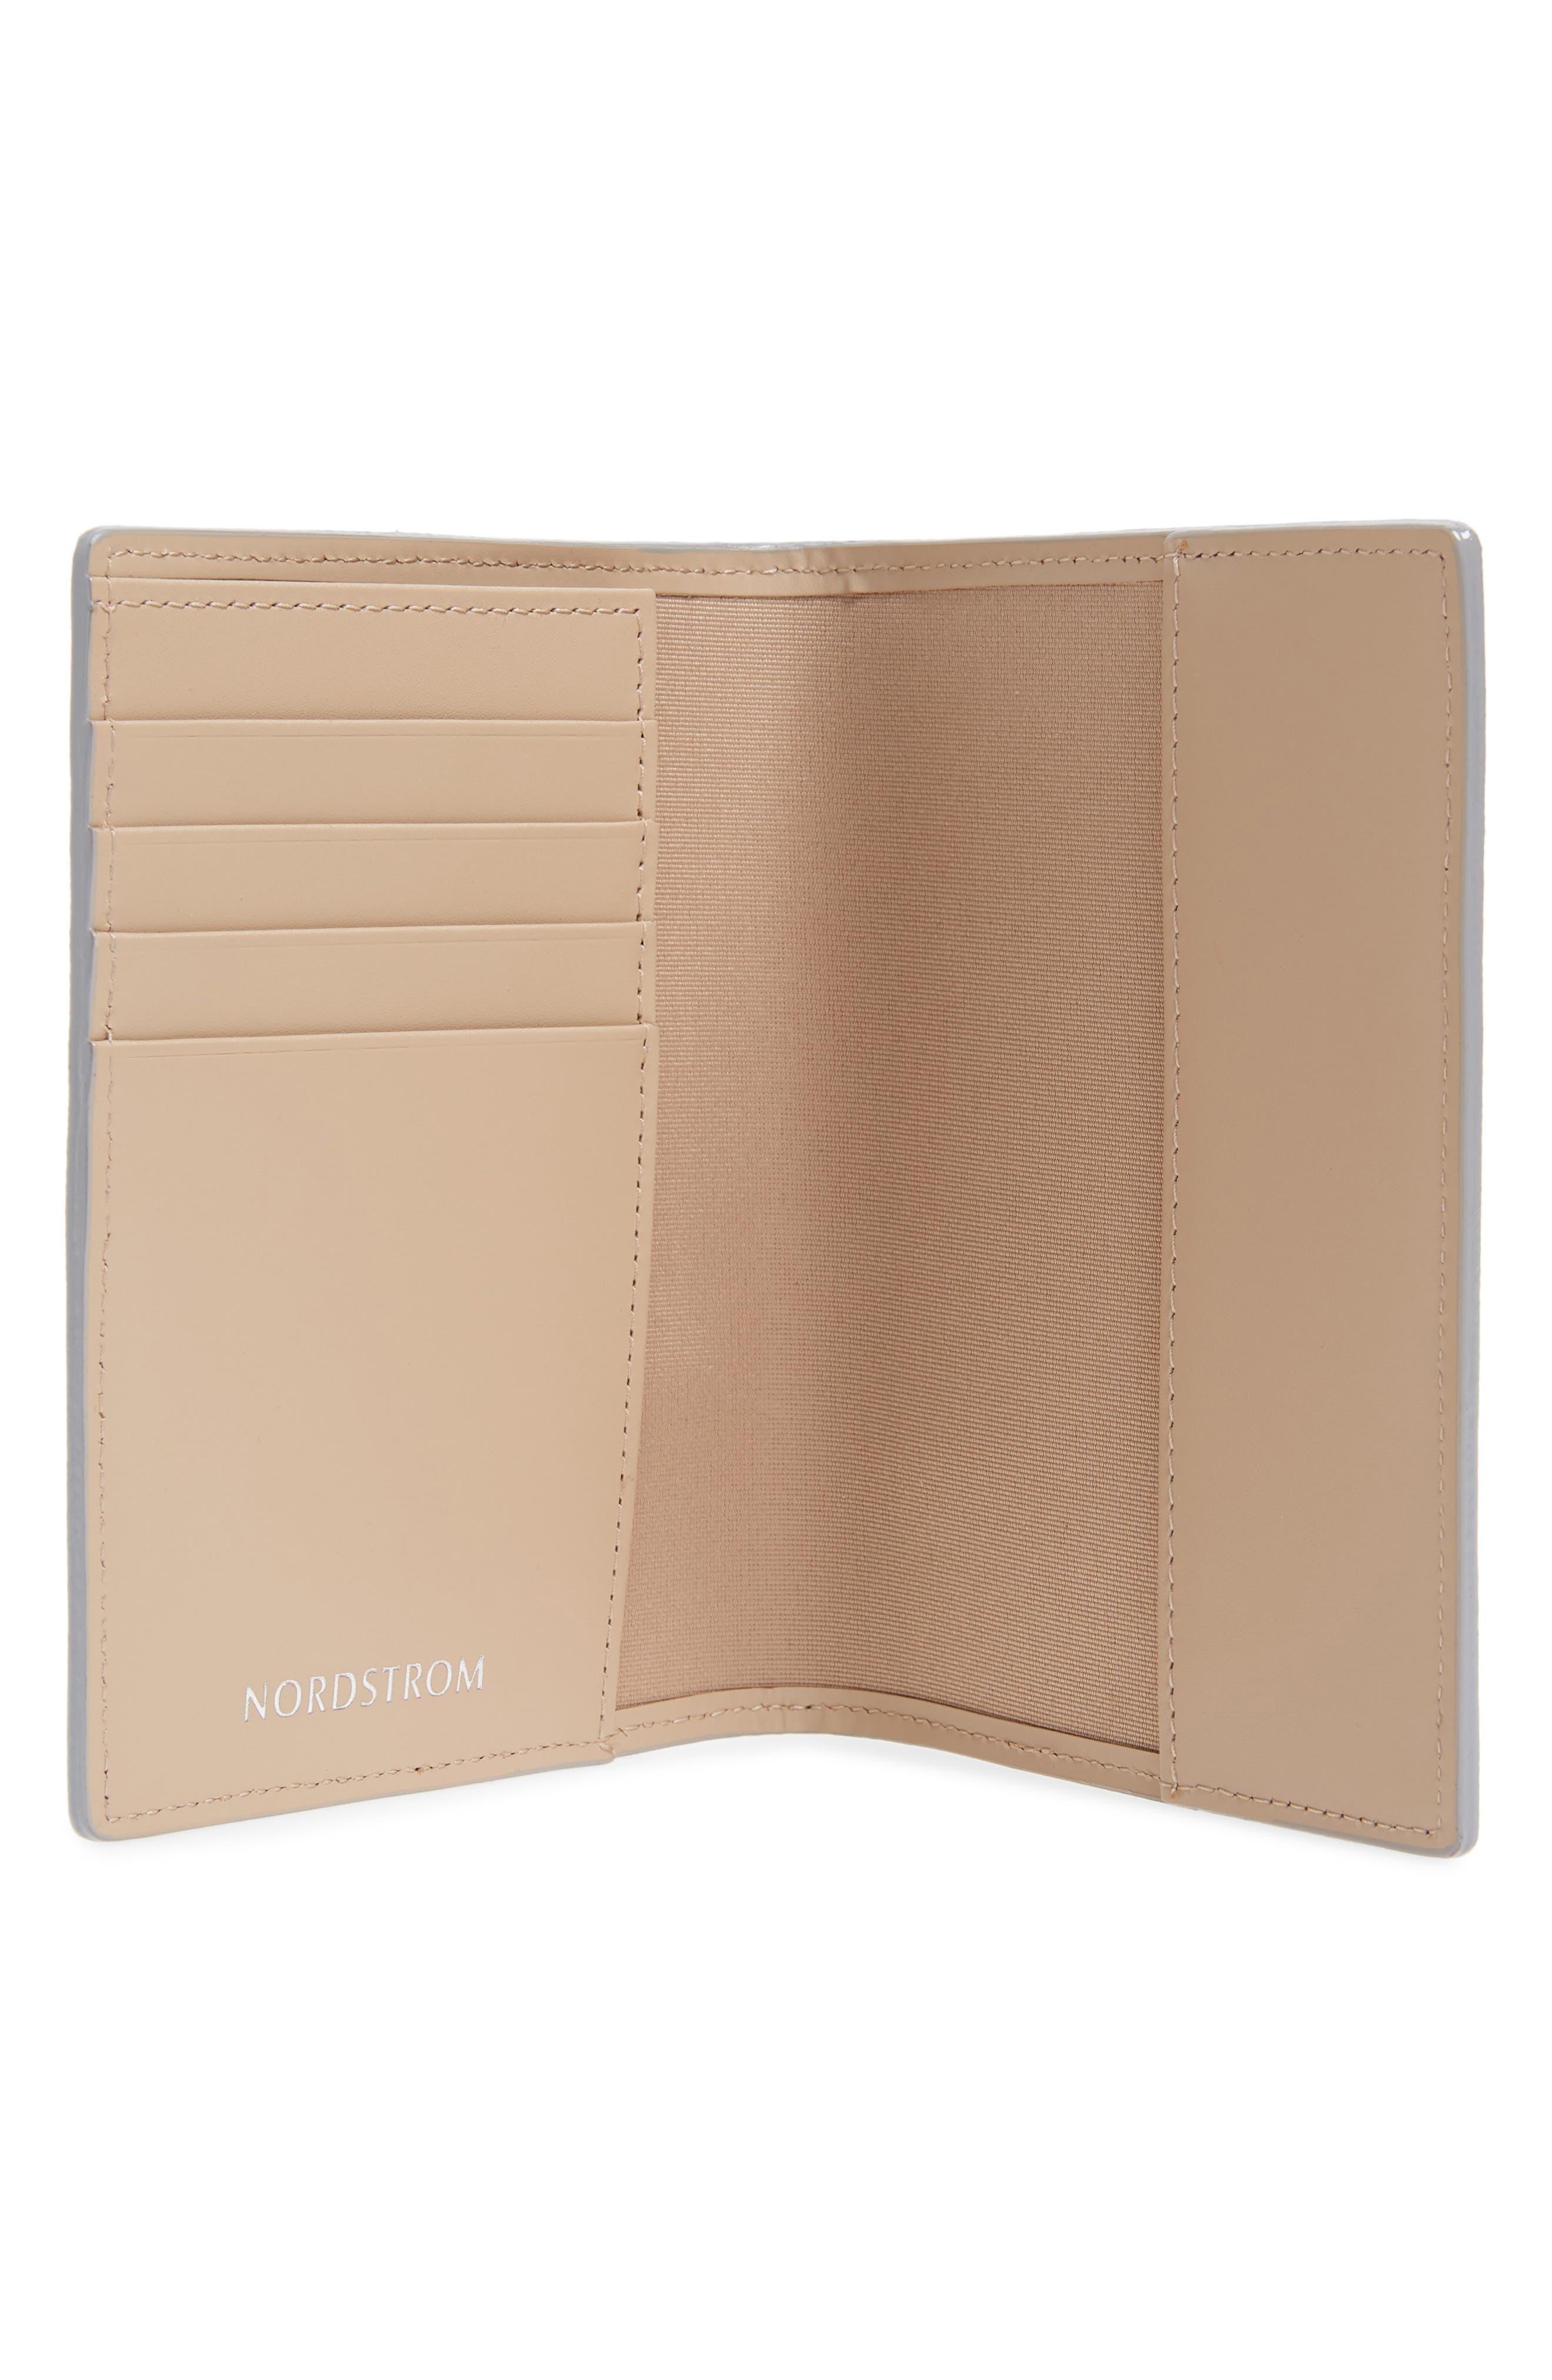 Leather Passport Case,                             Alternate thumbnail 2, color,                             White Silver